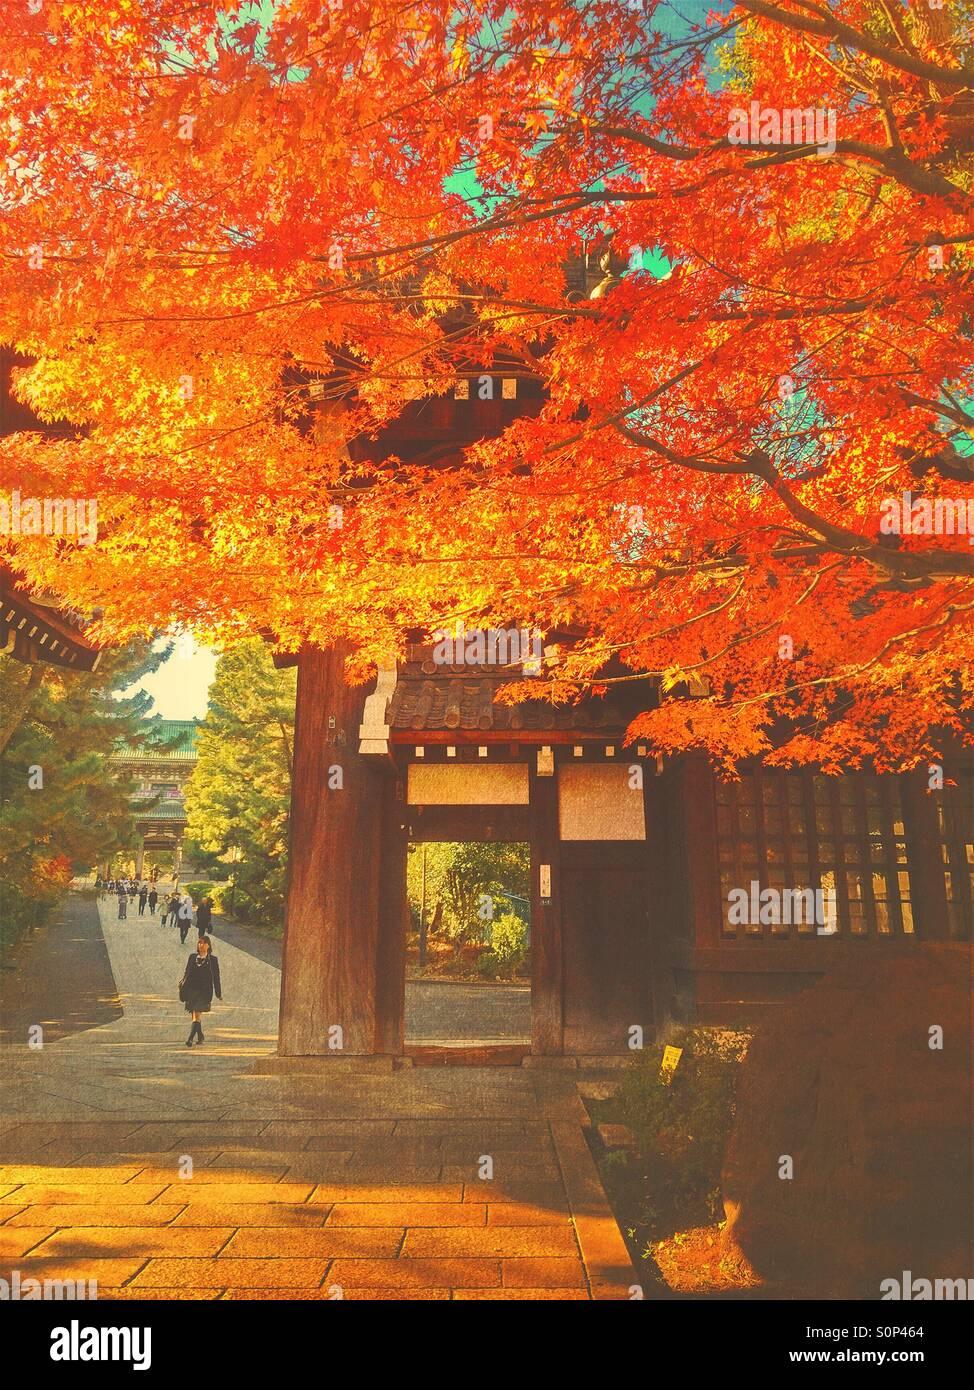 Beautiful fall scene with people and vibrant autumn foliage at Soji-ji Buddhist temple in Yokohama, Japan. Vintage Stock Photo